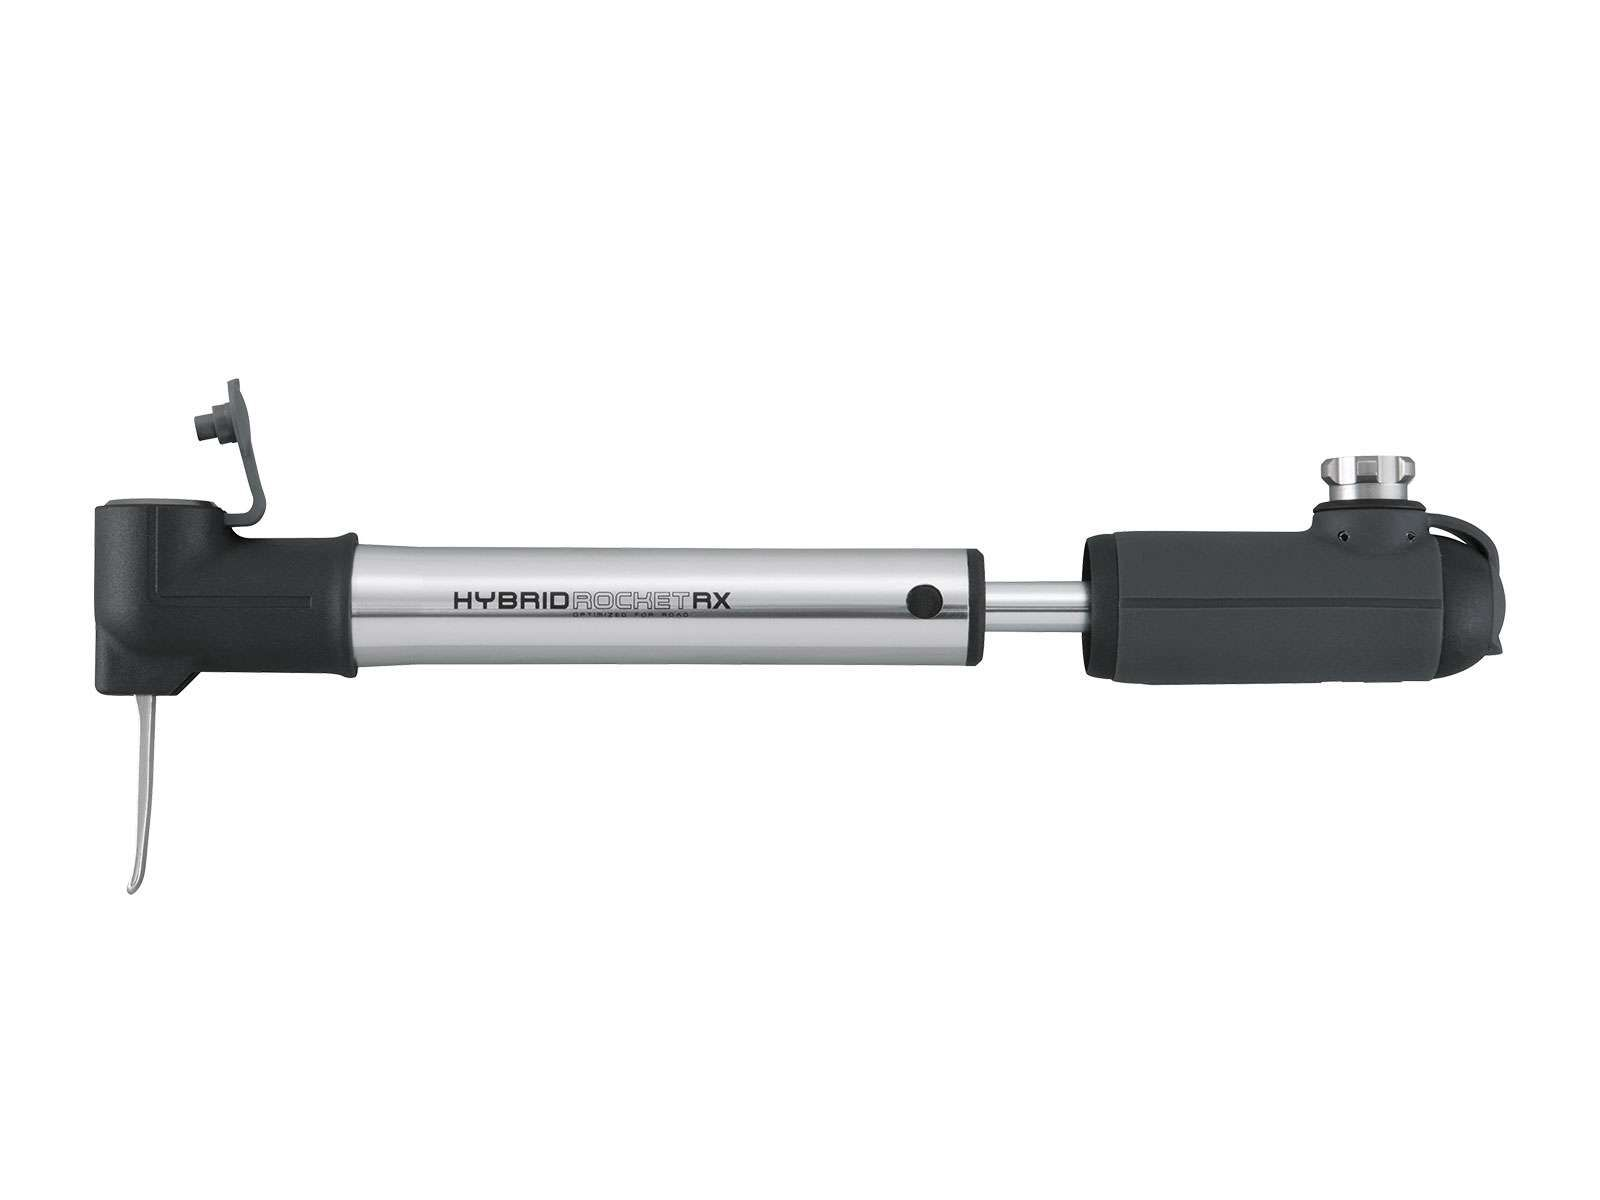 Bomba Topeak - Hybridrocket Rx - c/ Inflador CO2 - THR-RX1G